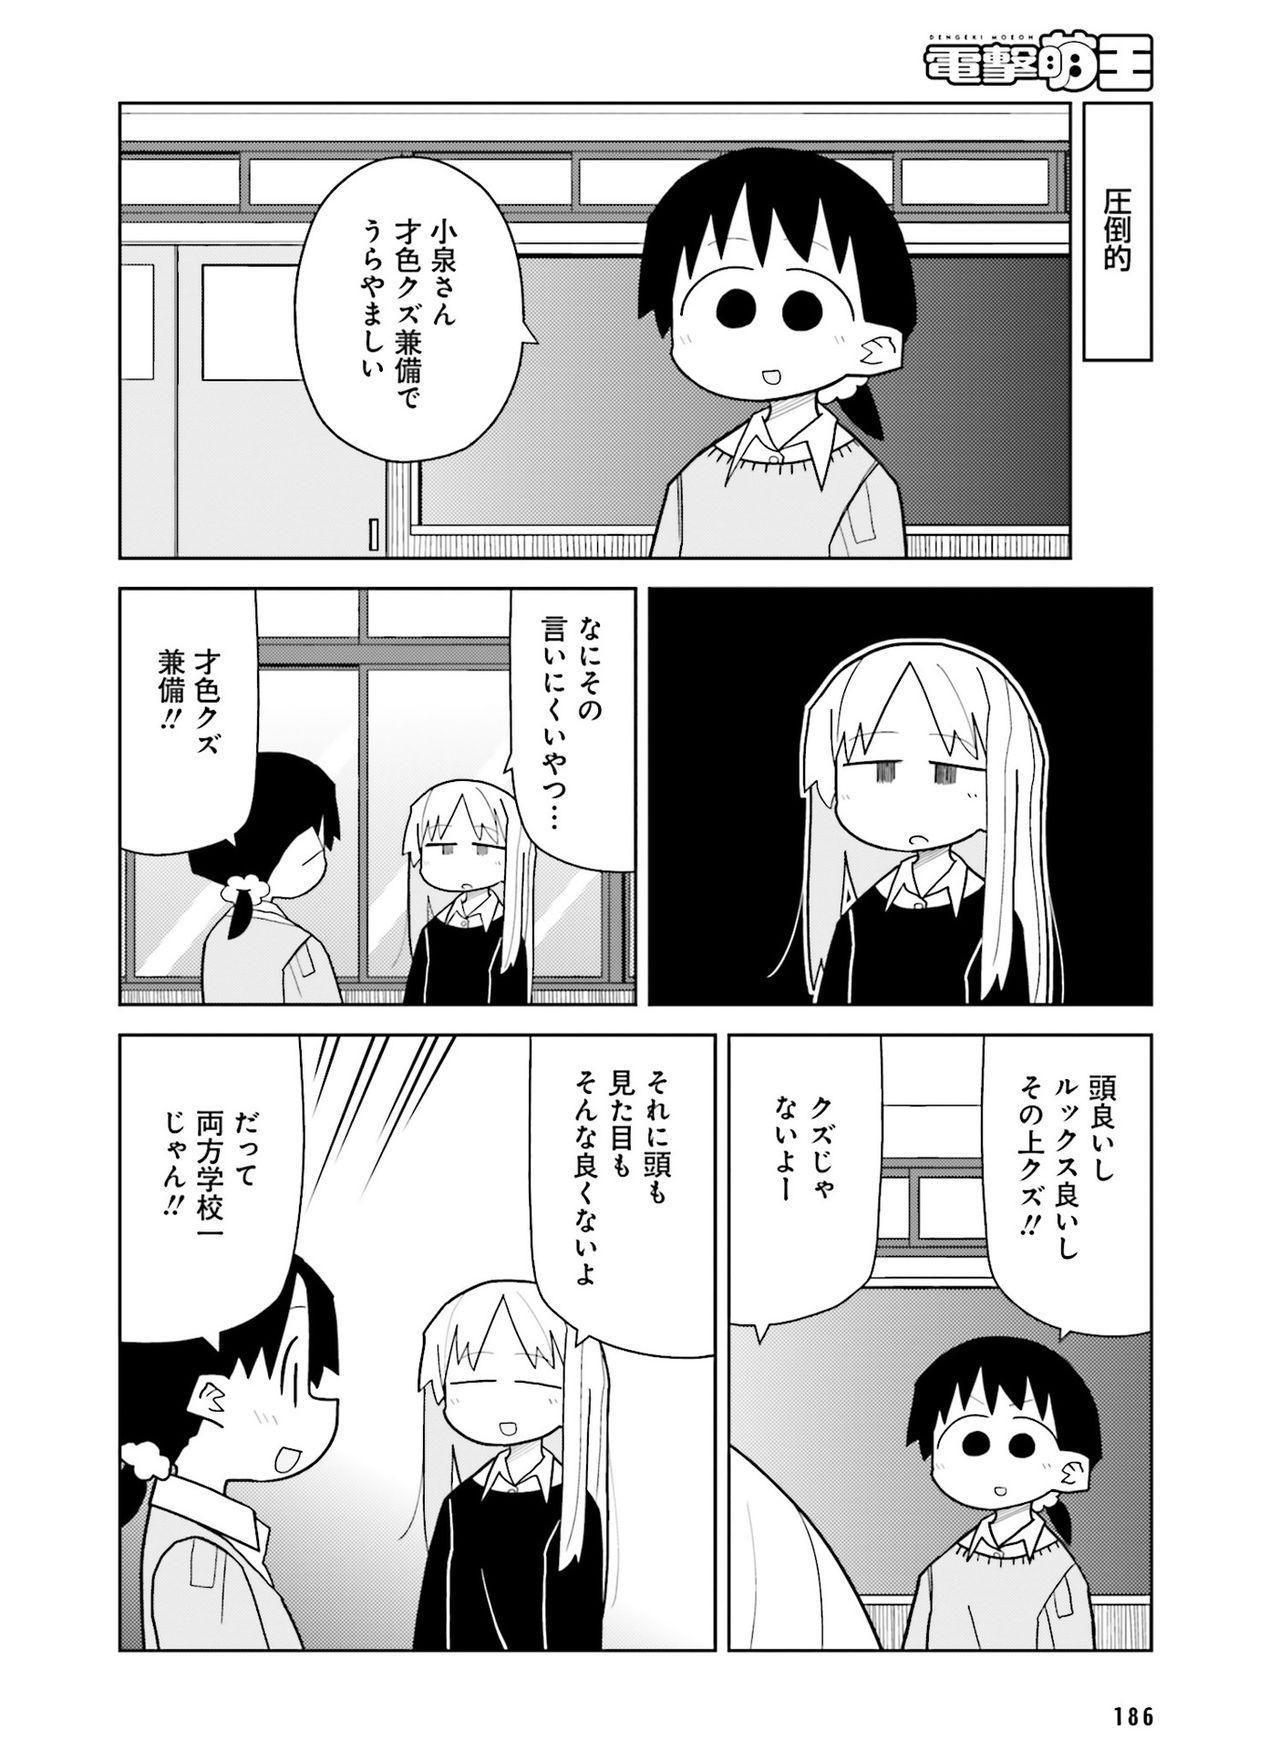 Dengeki Moeoh 2016-12 177